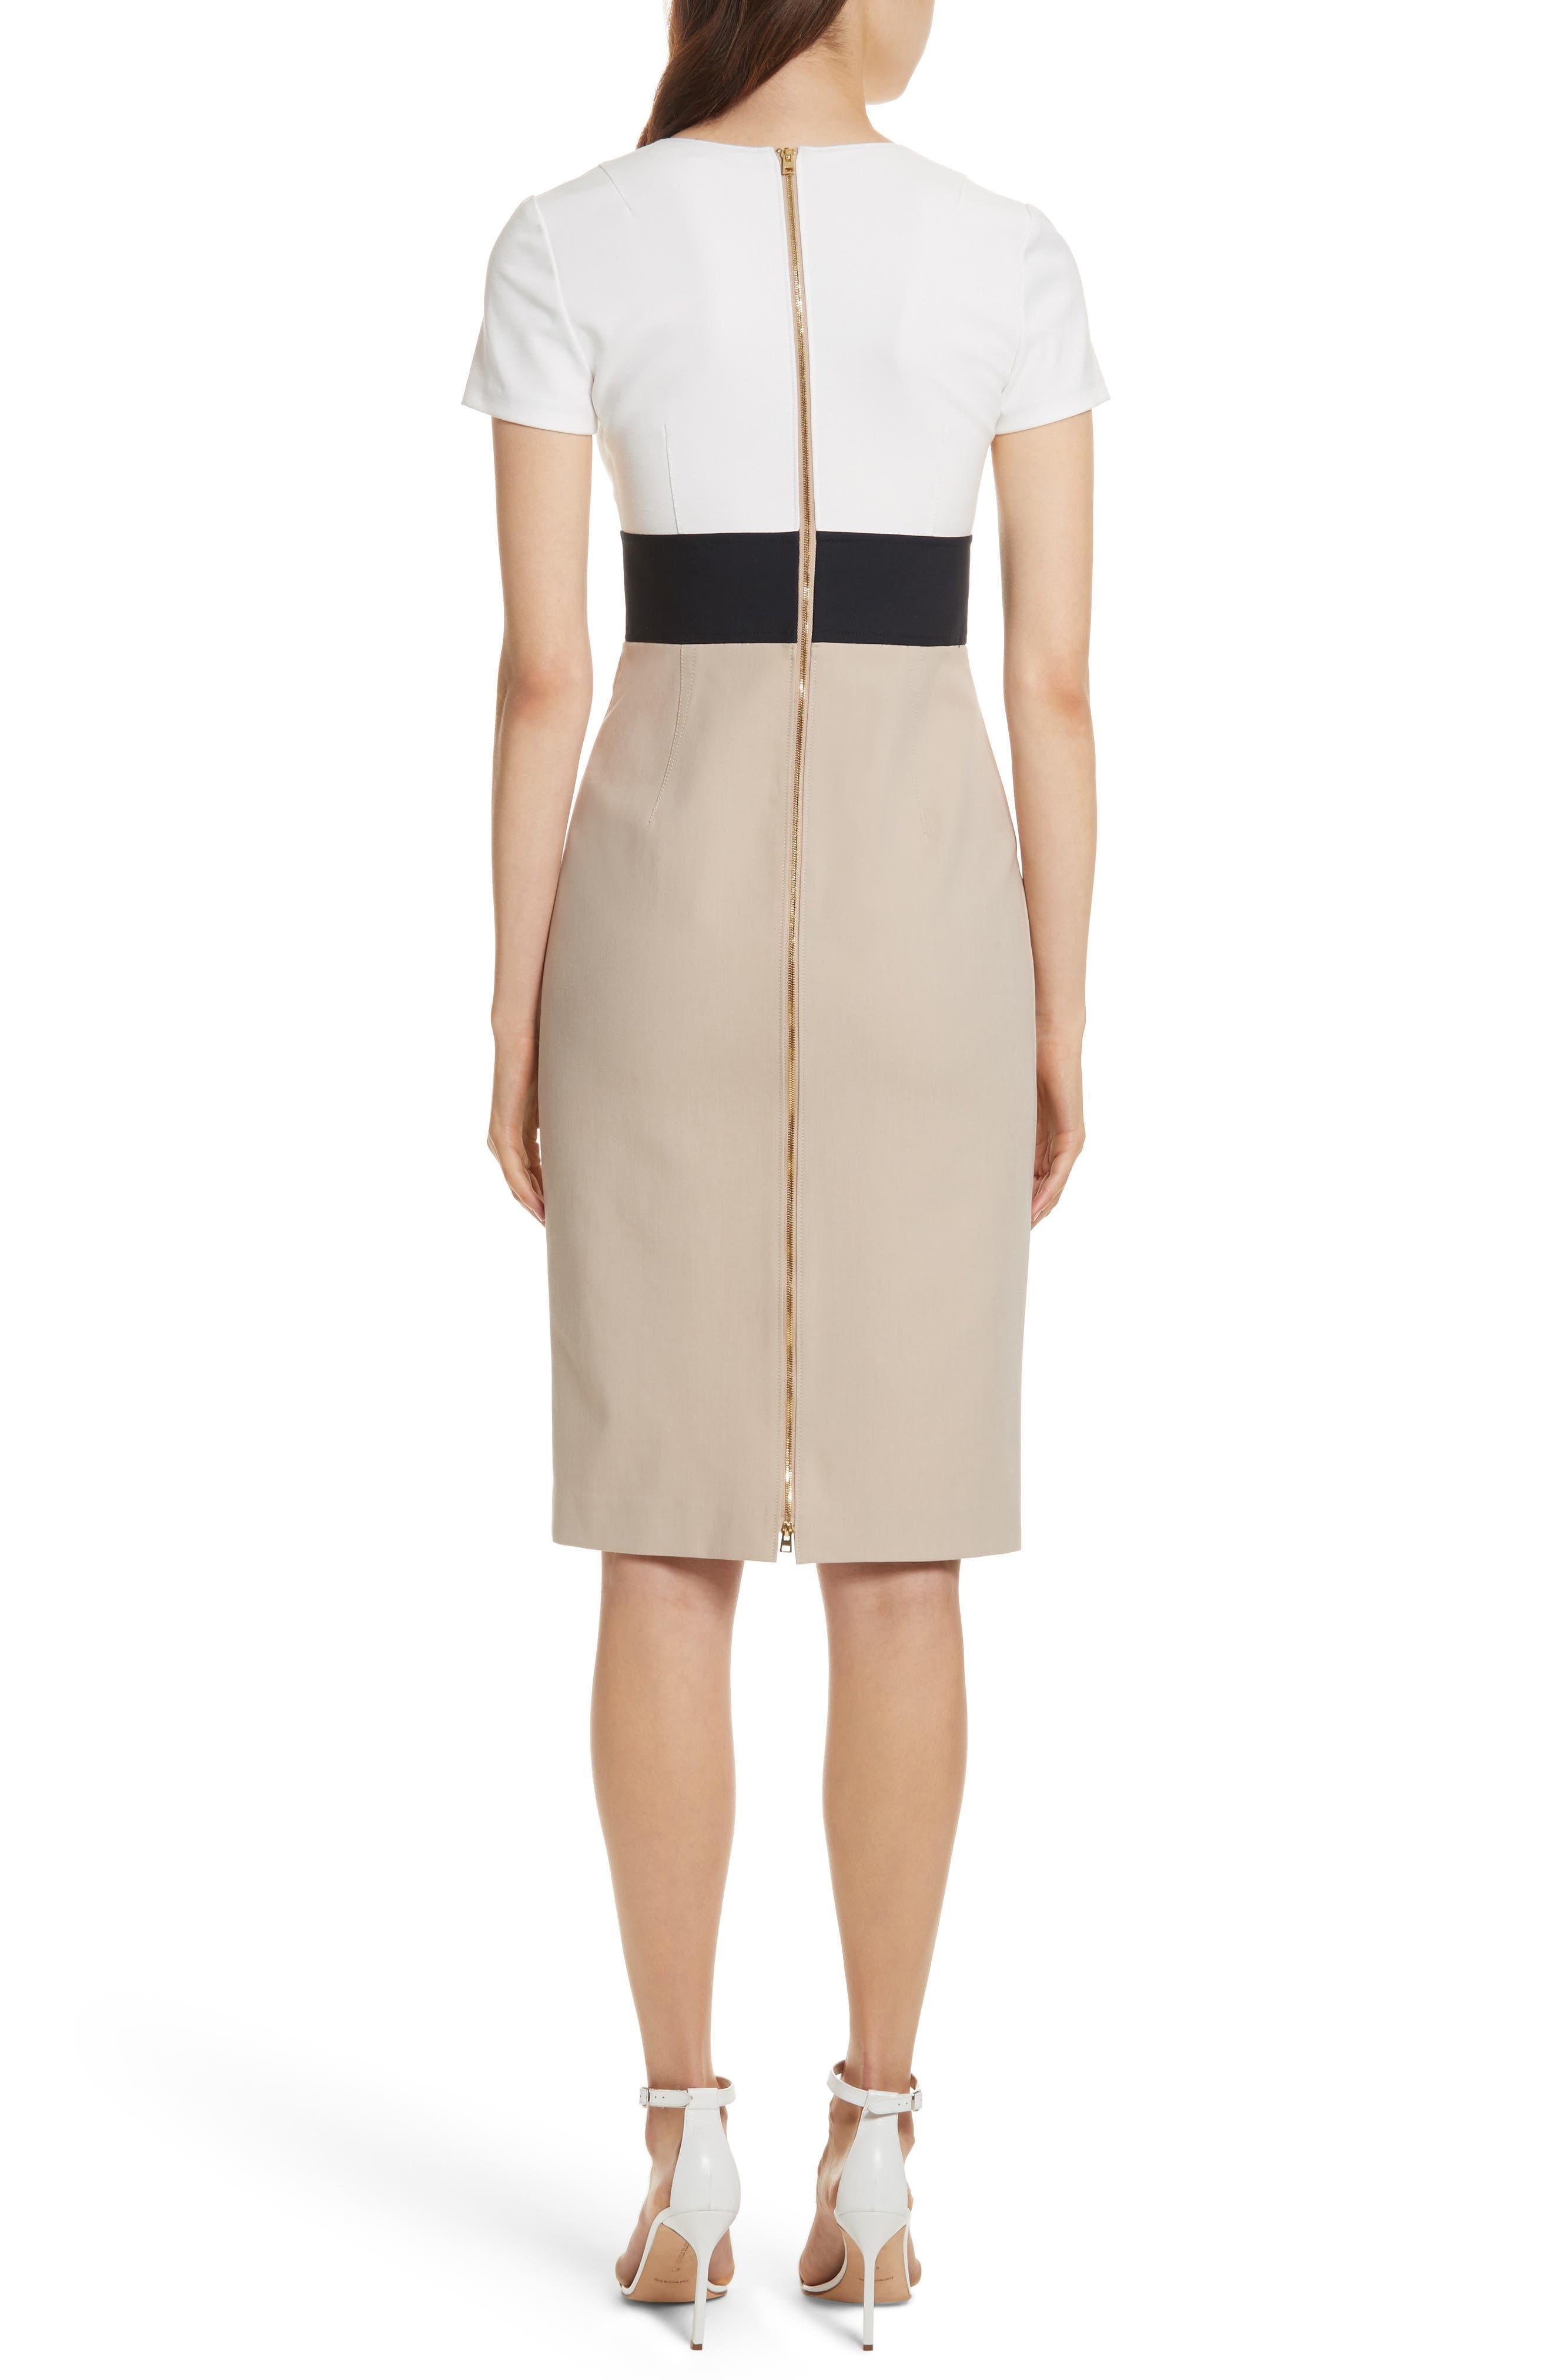 Diane von Furstenberg Colorblock Stretch Cotton Blend Sheath Dress,                             Alternate thumbnail 2, color,